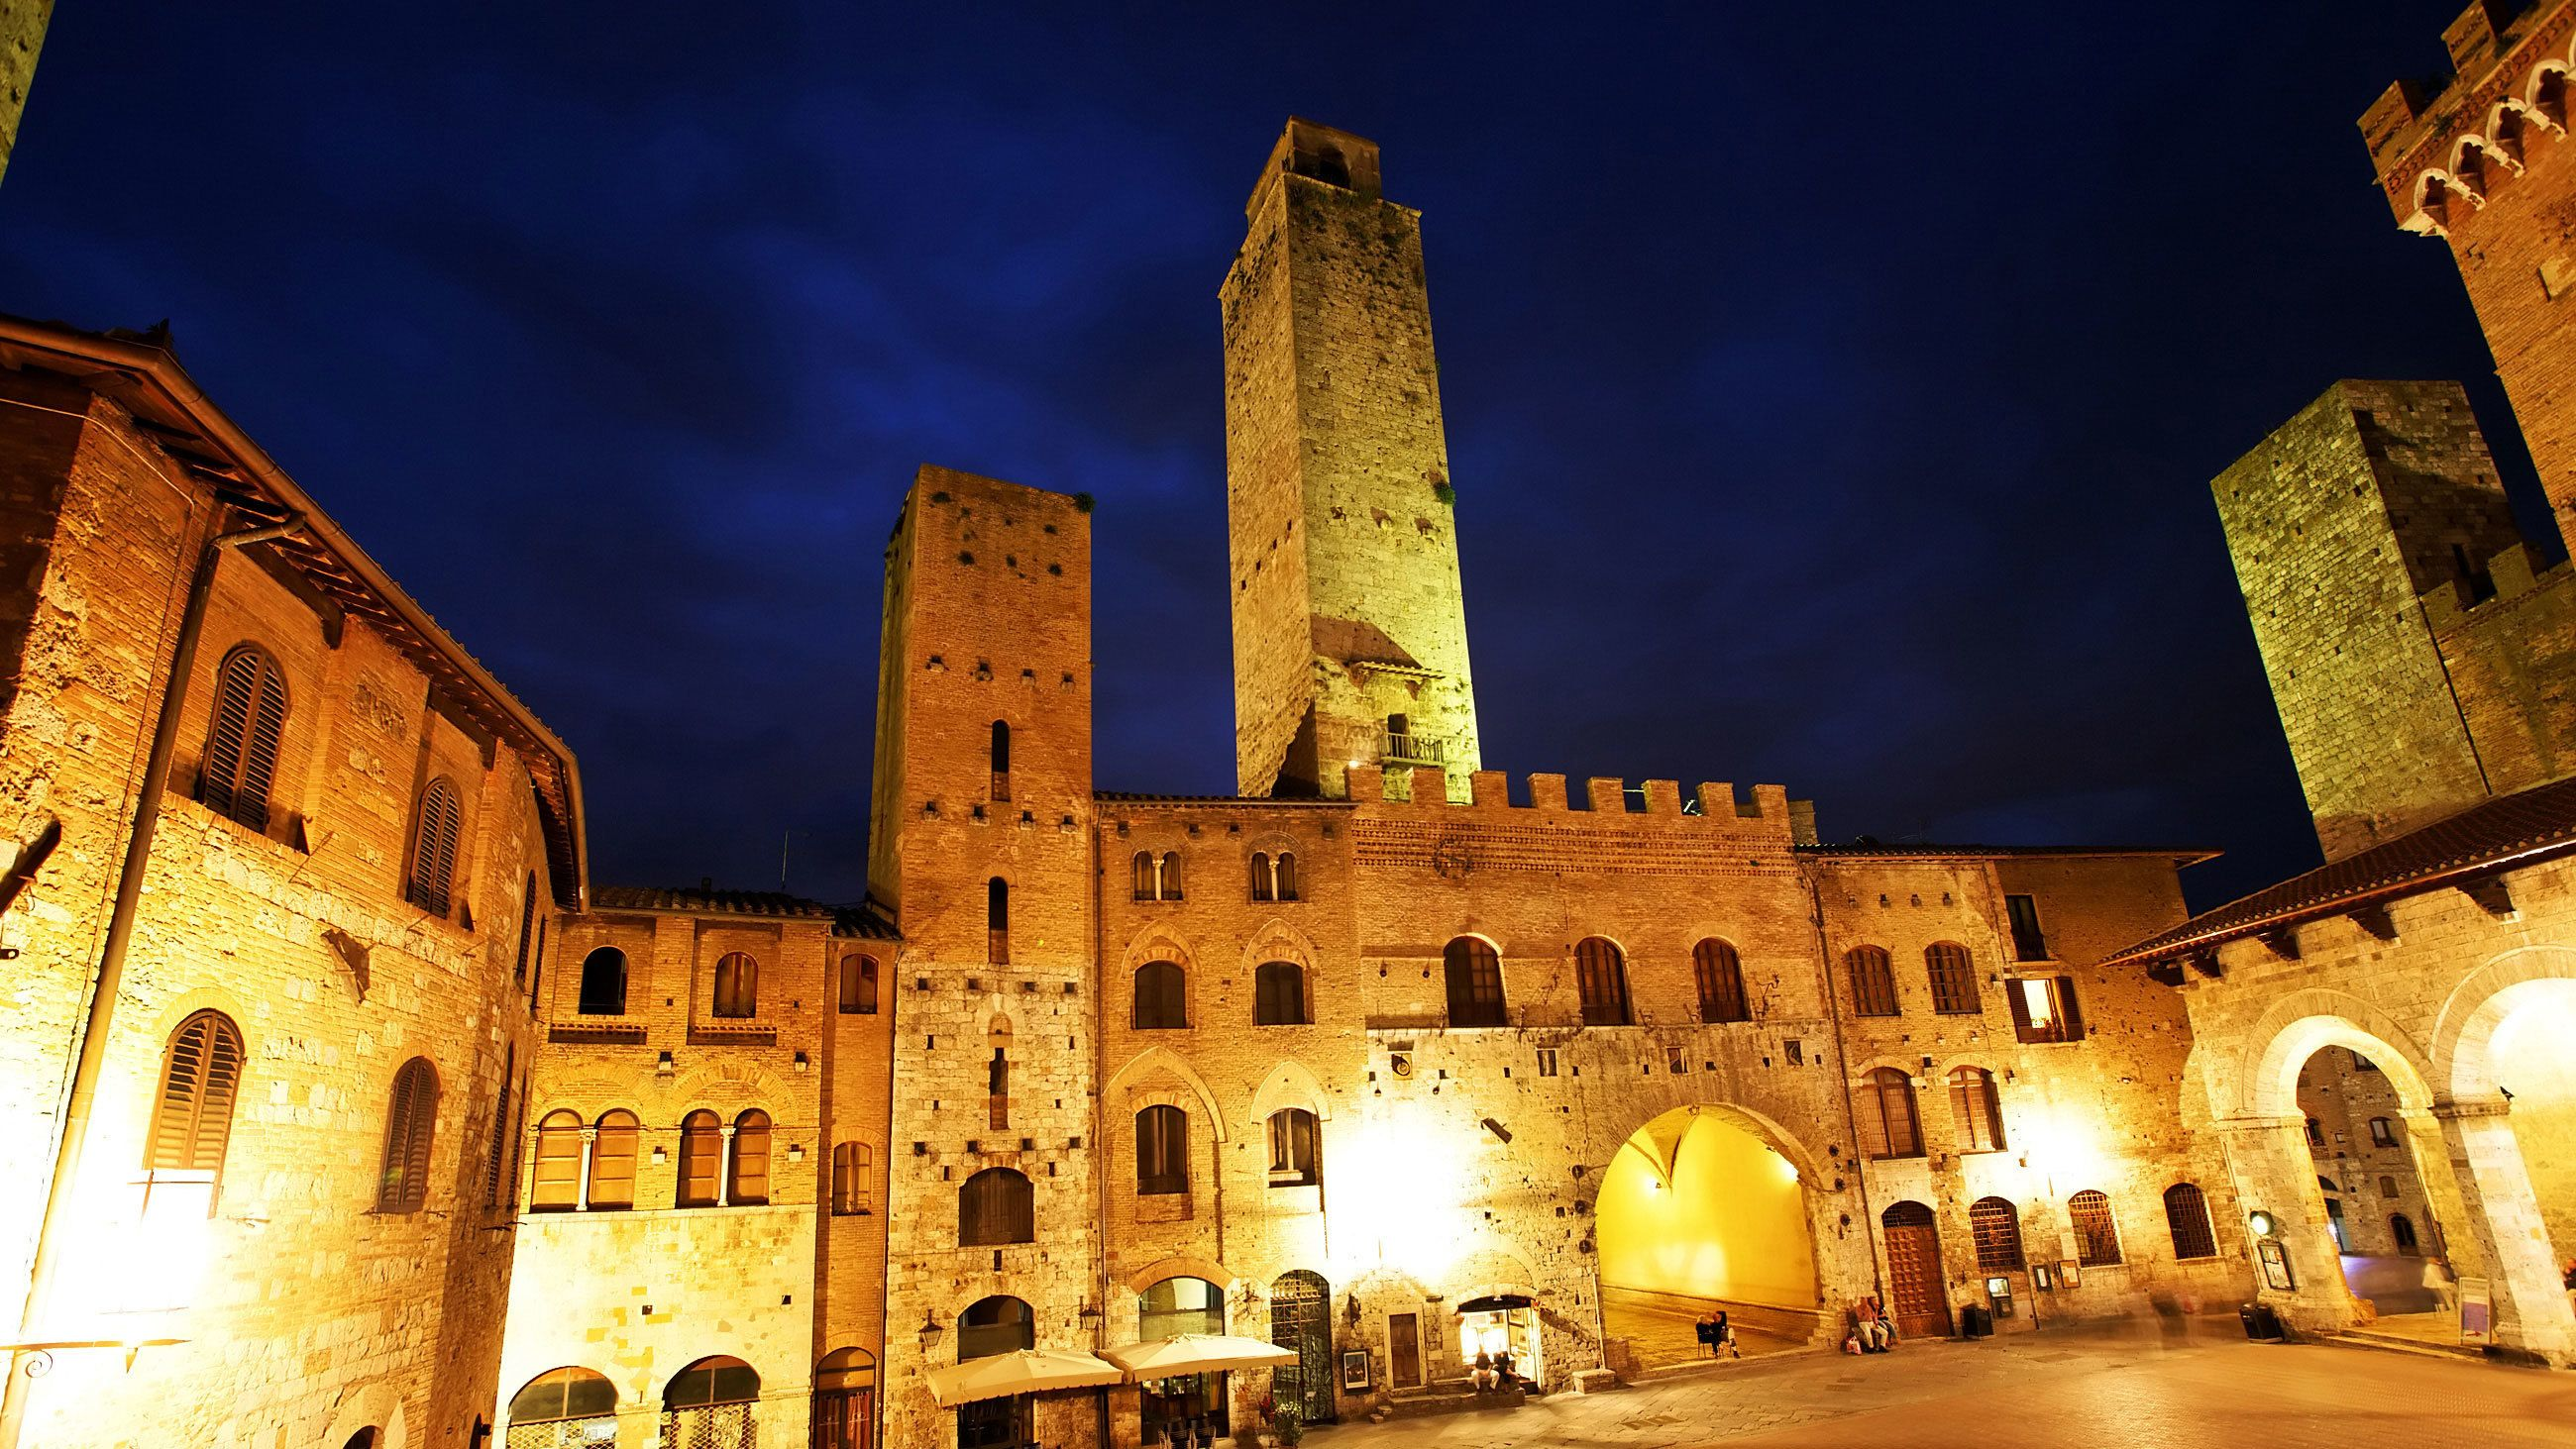 illuminated stone buildings in Italy